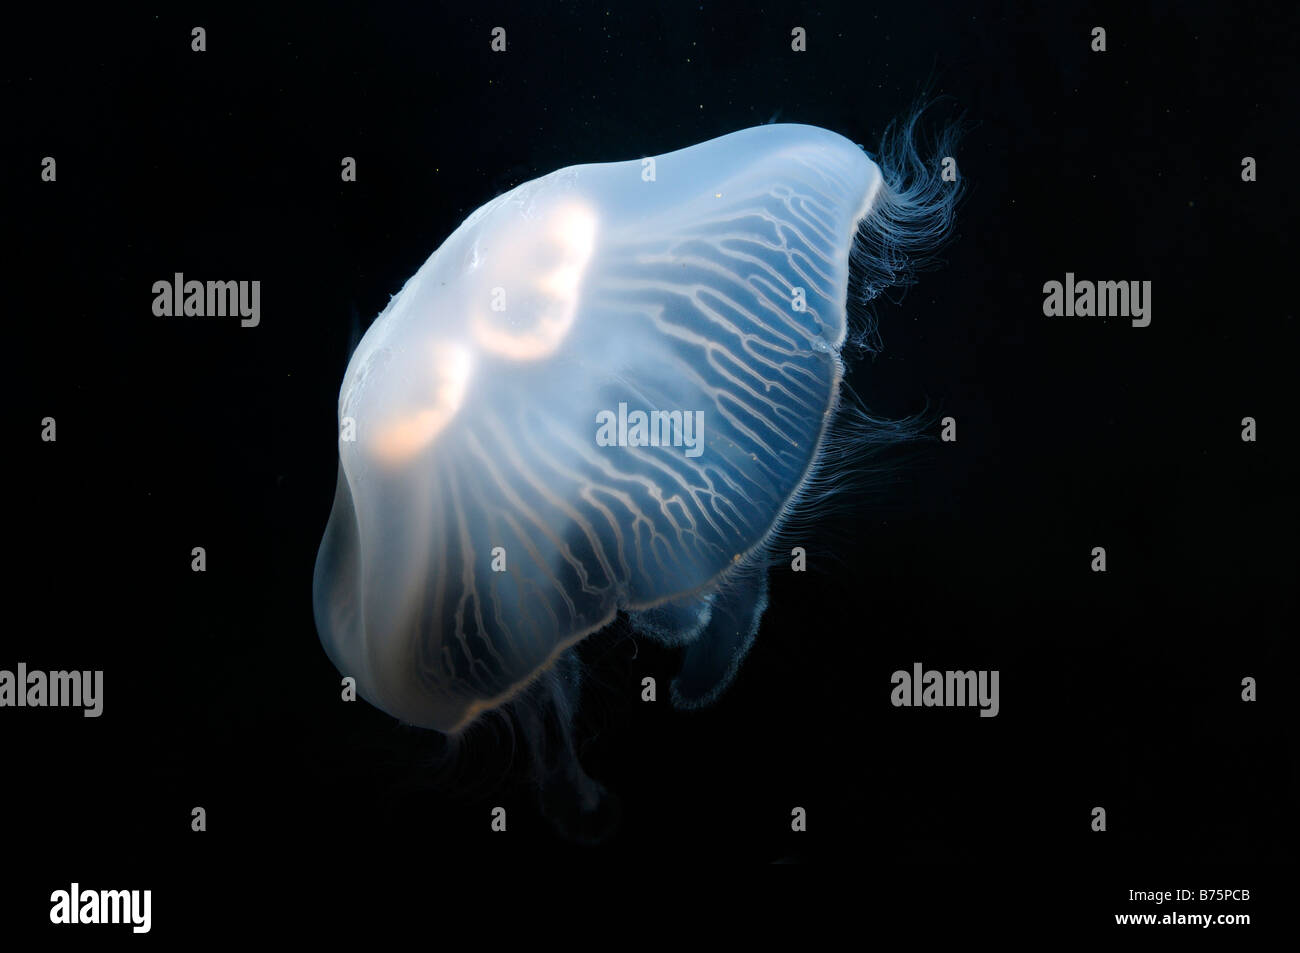 Luna medusa Aurelia aurita cautivo Imagen De Stock